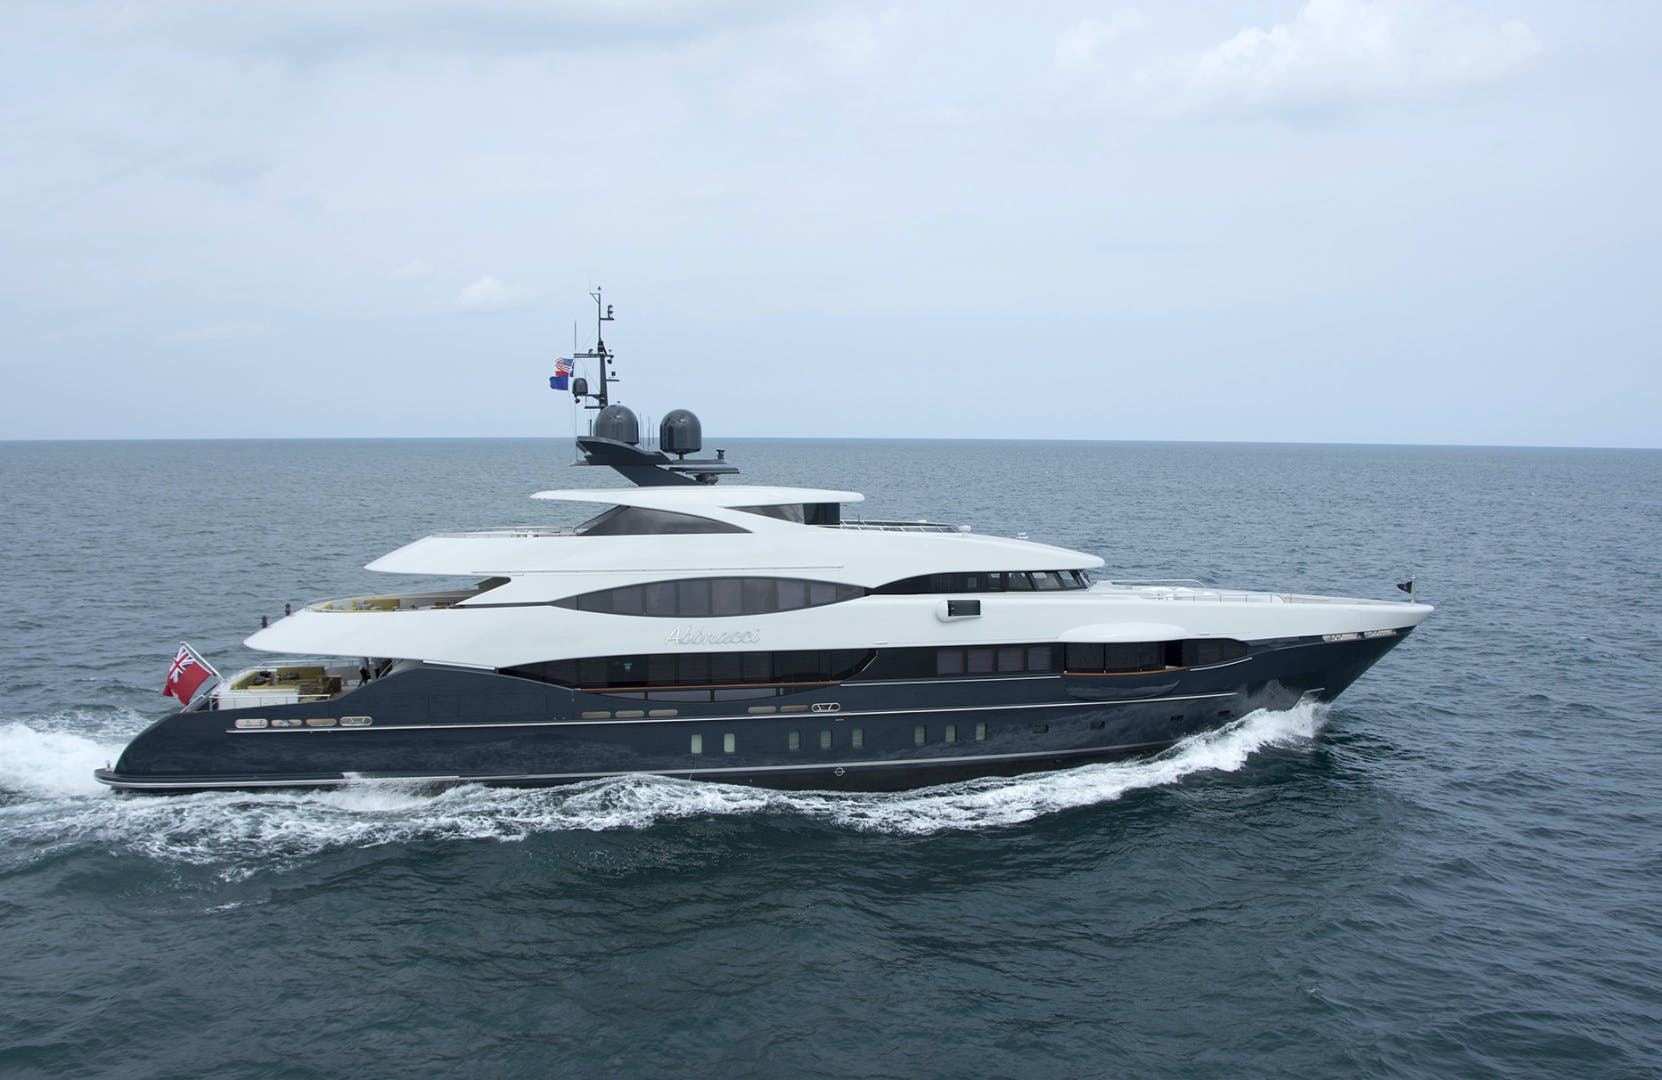 2011 Heesen Yachts 180' Lloyds, LY2/MCA Abbracci | Picture 1 of 11